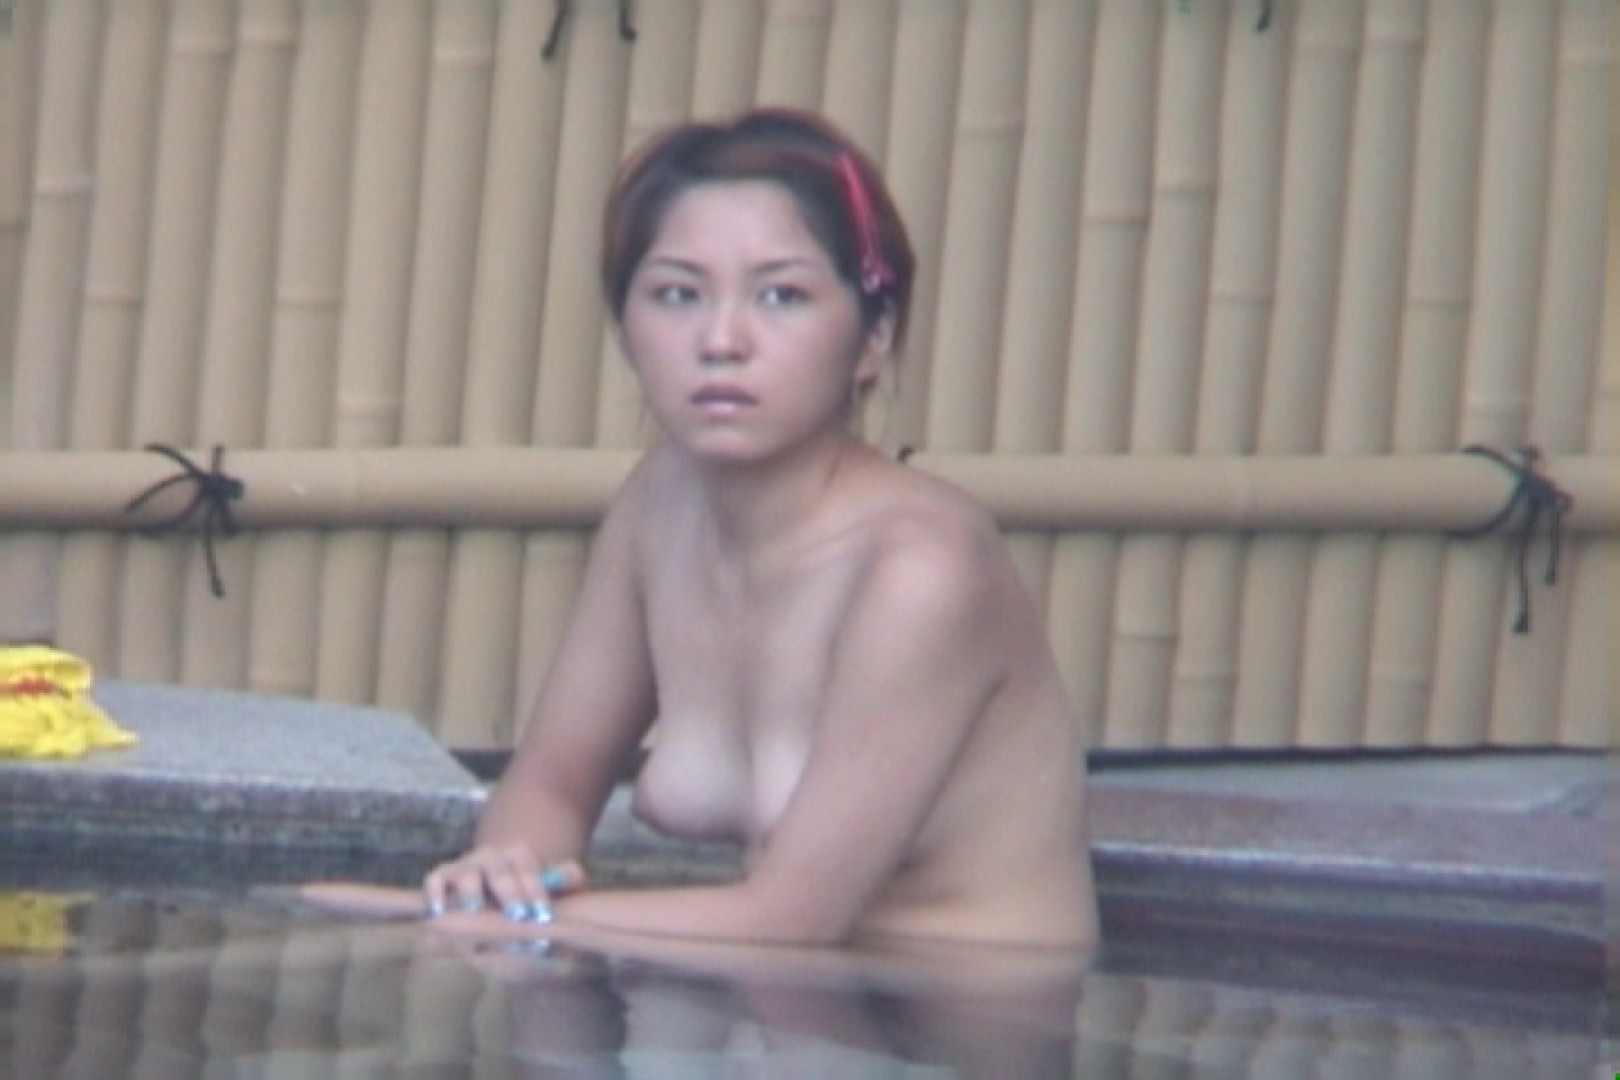 Aquaな露天風呂Vol.574 盗撮 | OLセックス  97画像 67